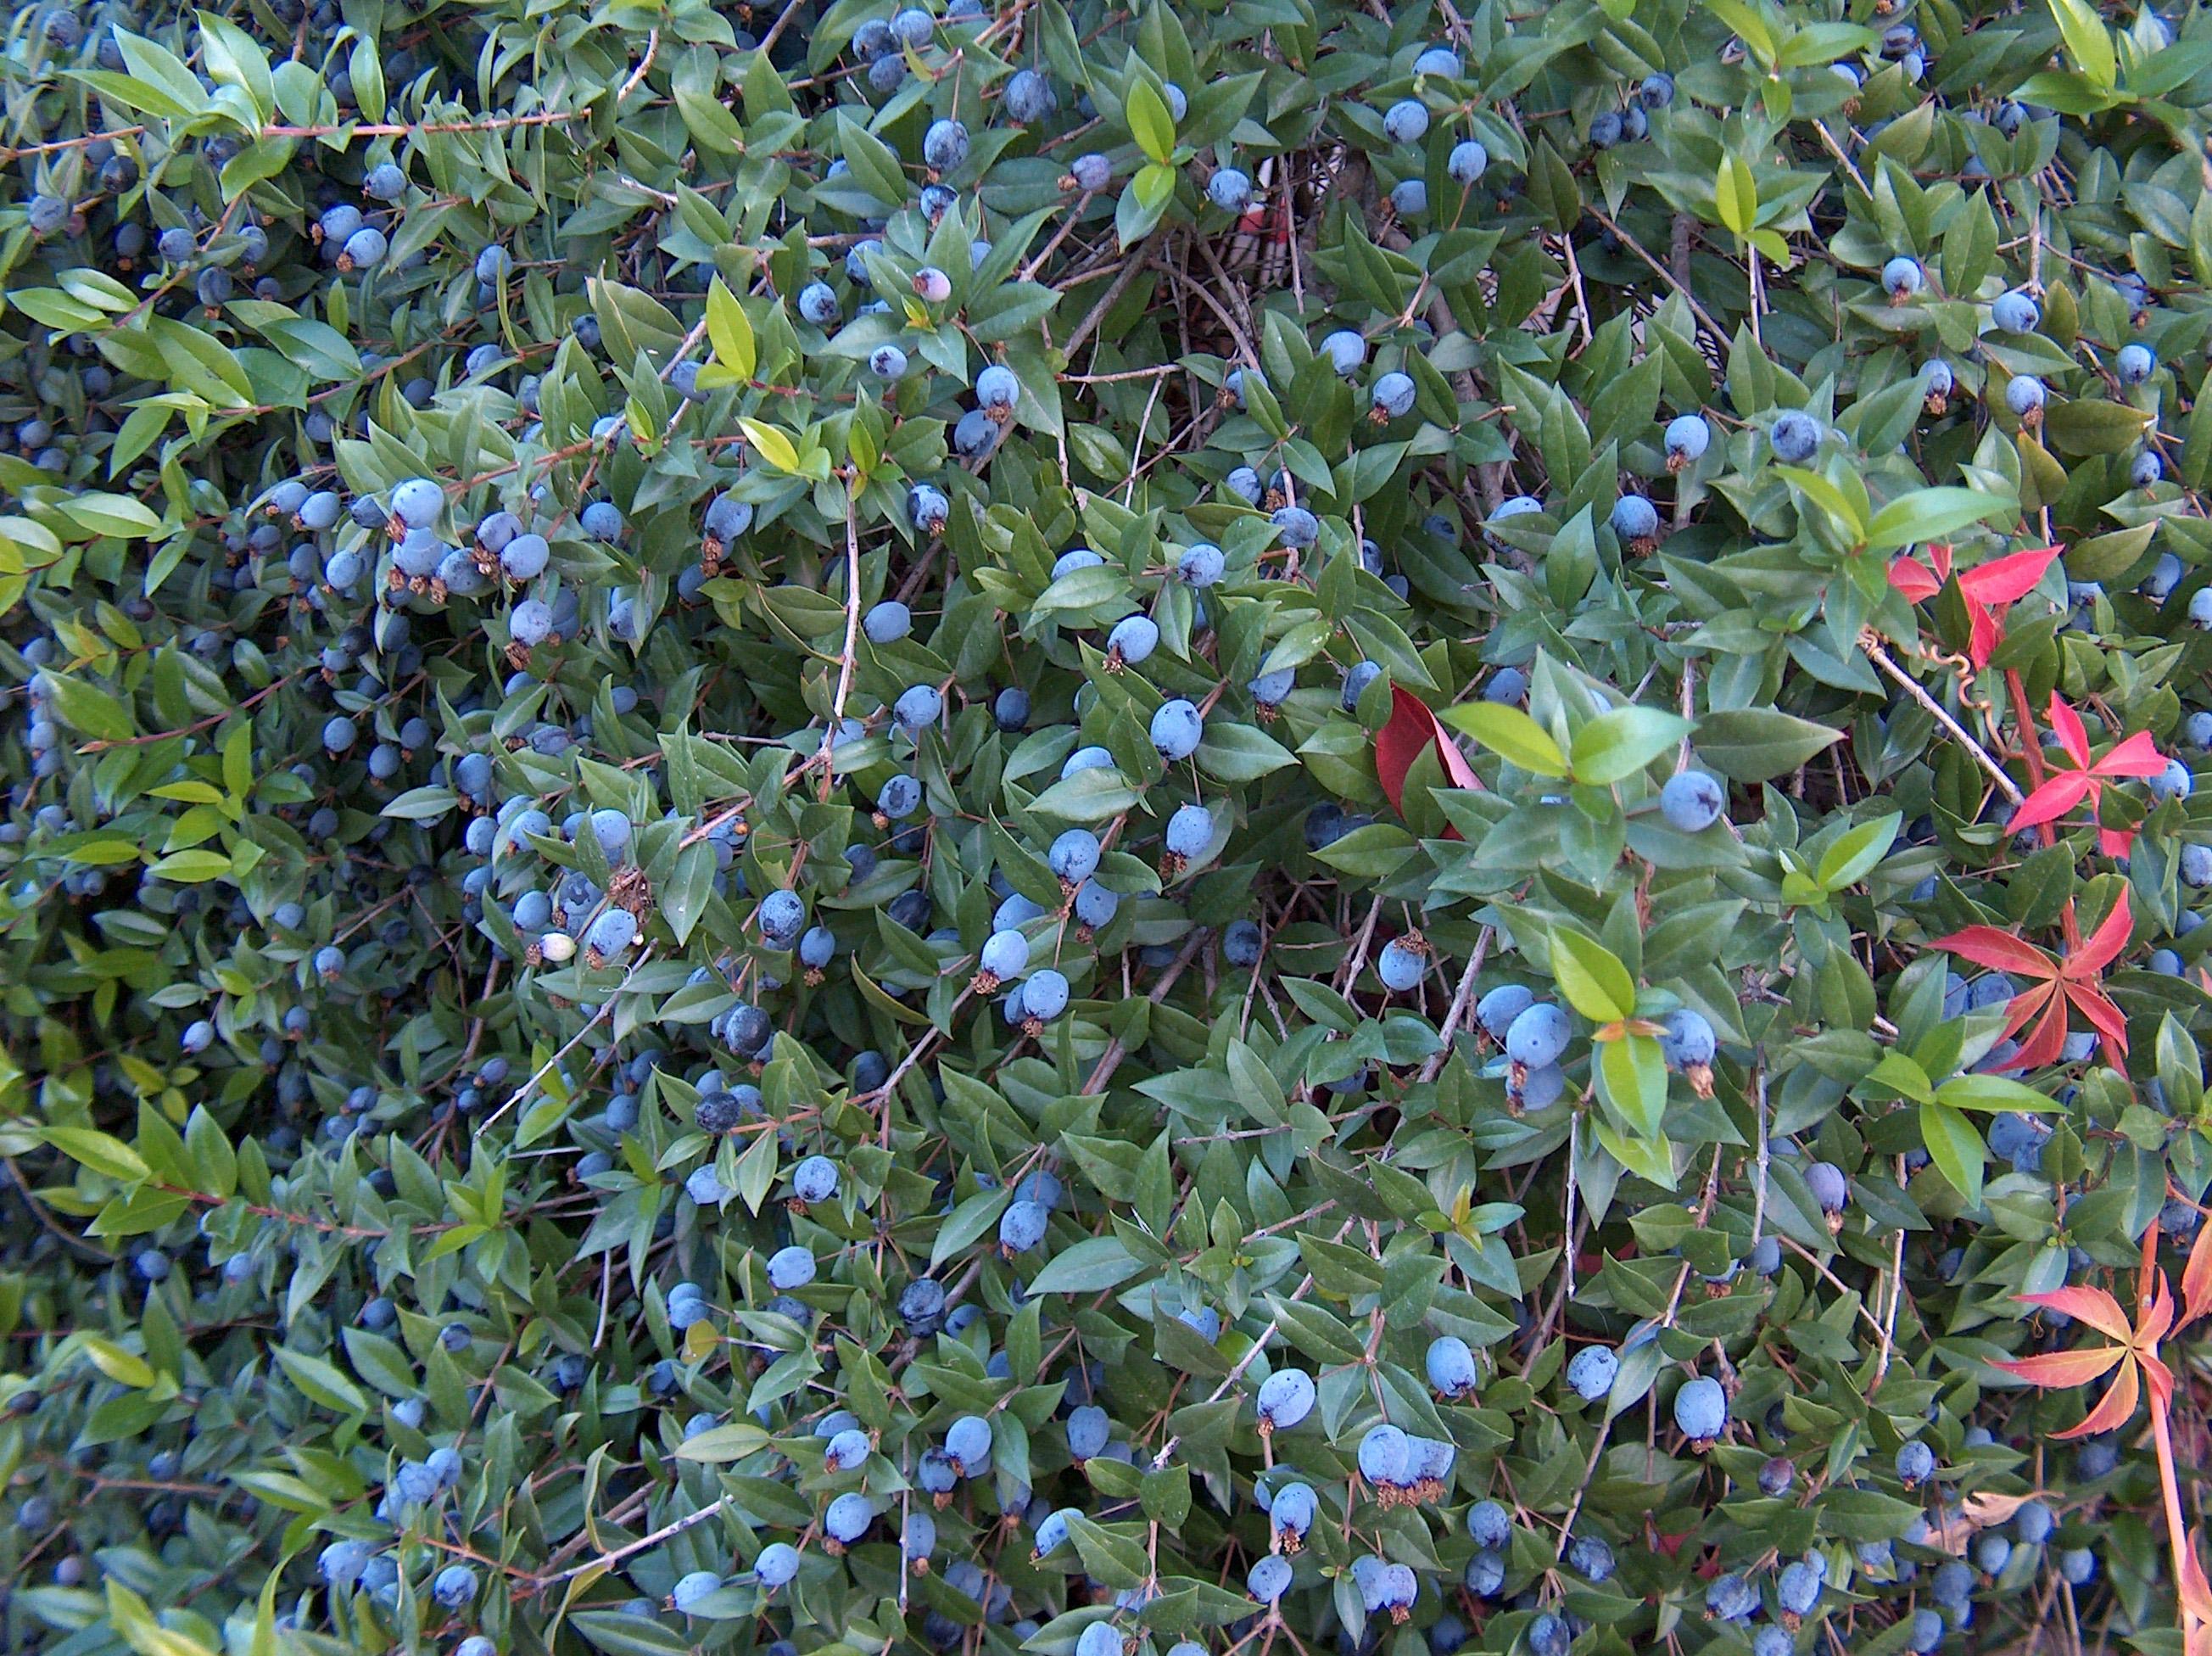 Murta fantastipedia for Myrte arbuste